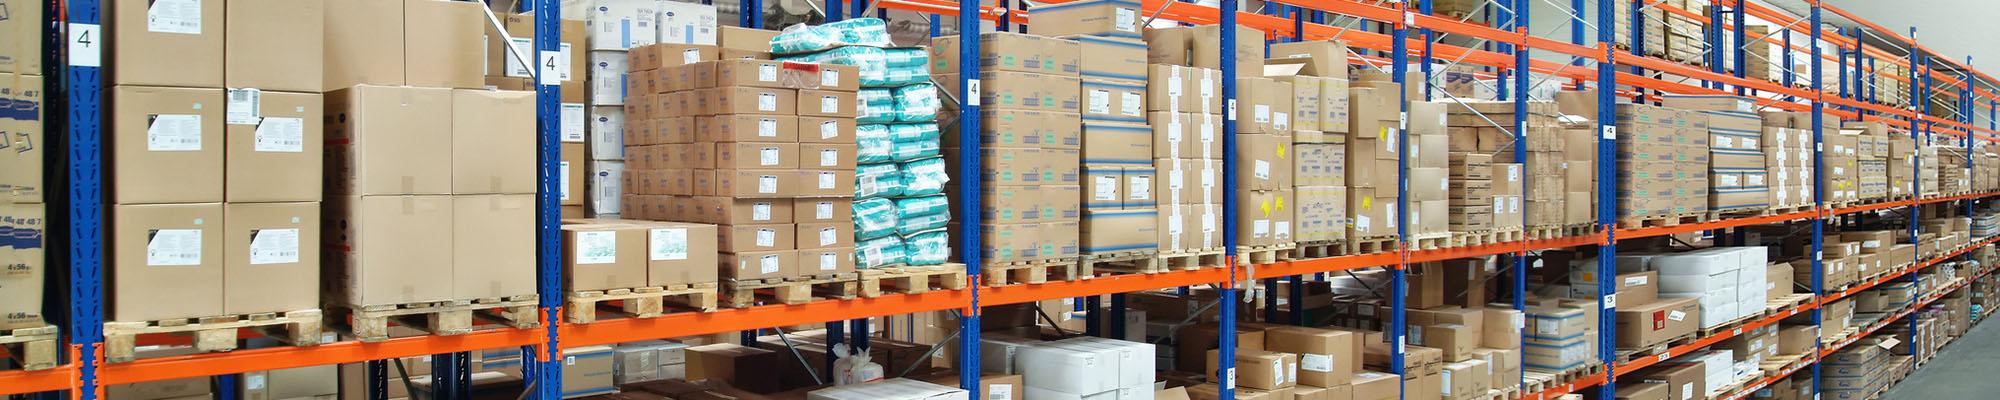 AM Group : entreposage, emballage, expertise, conseil et audit